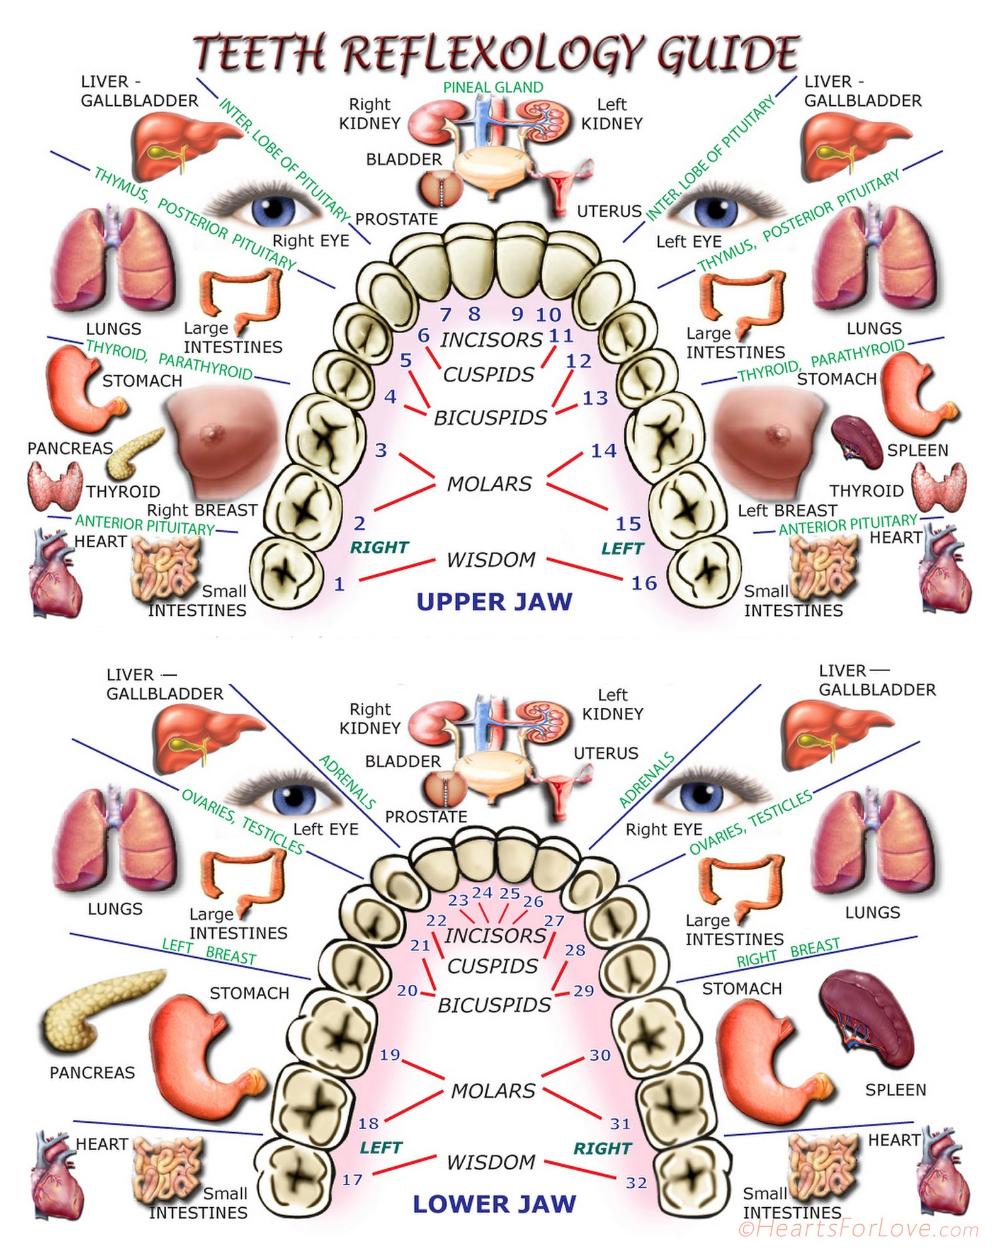 Pin on Teeth Reflexology Guide